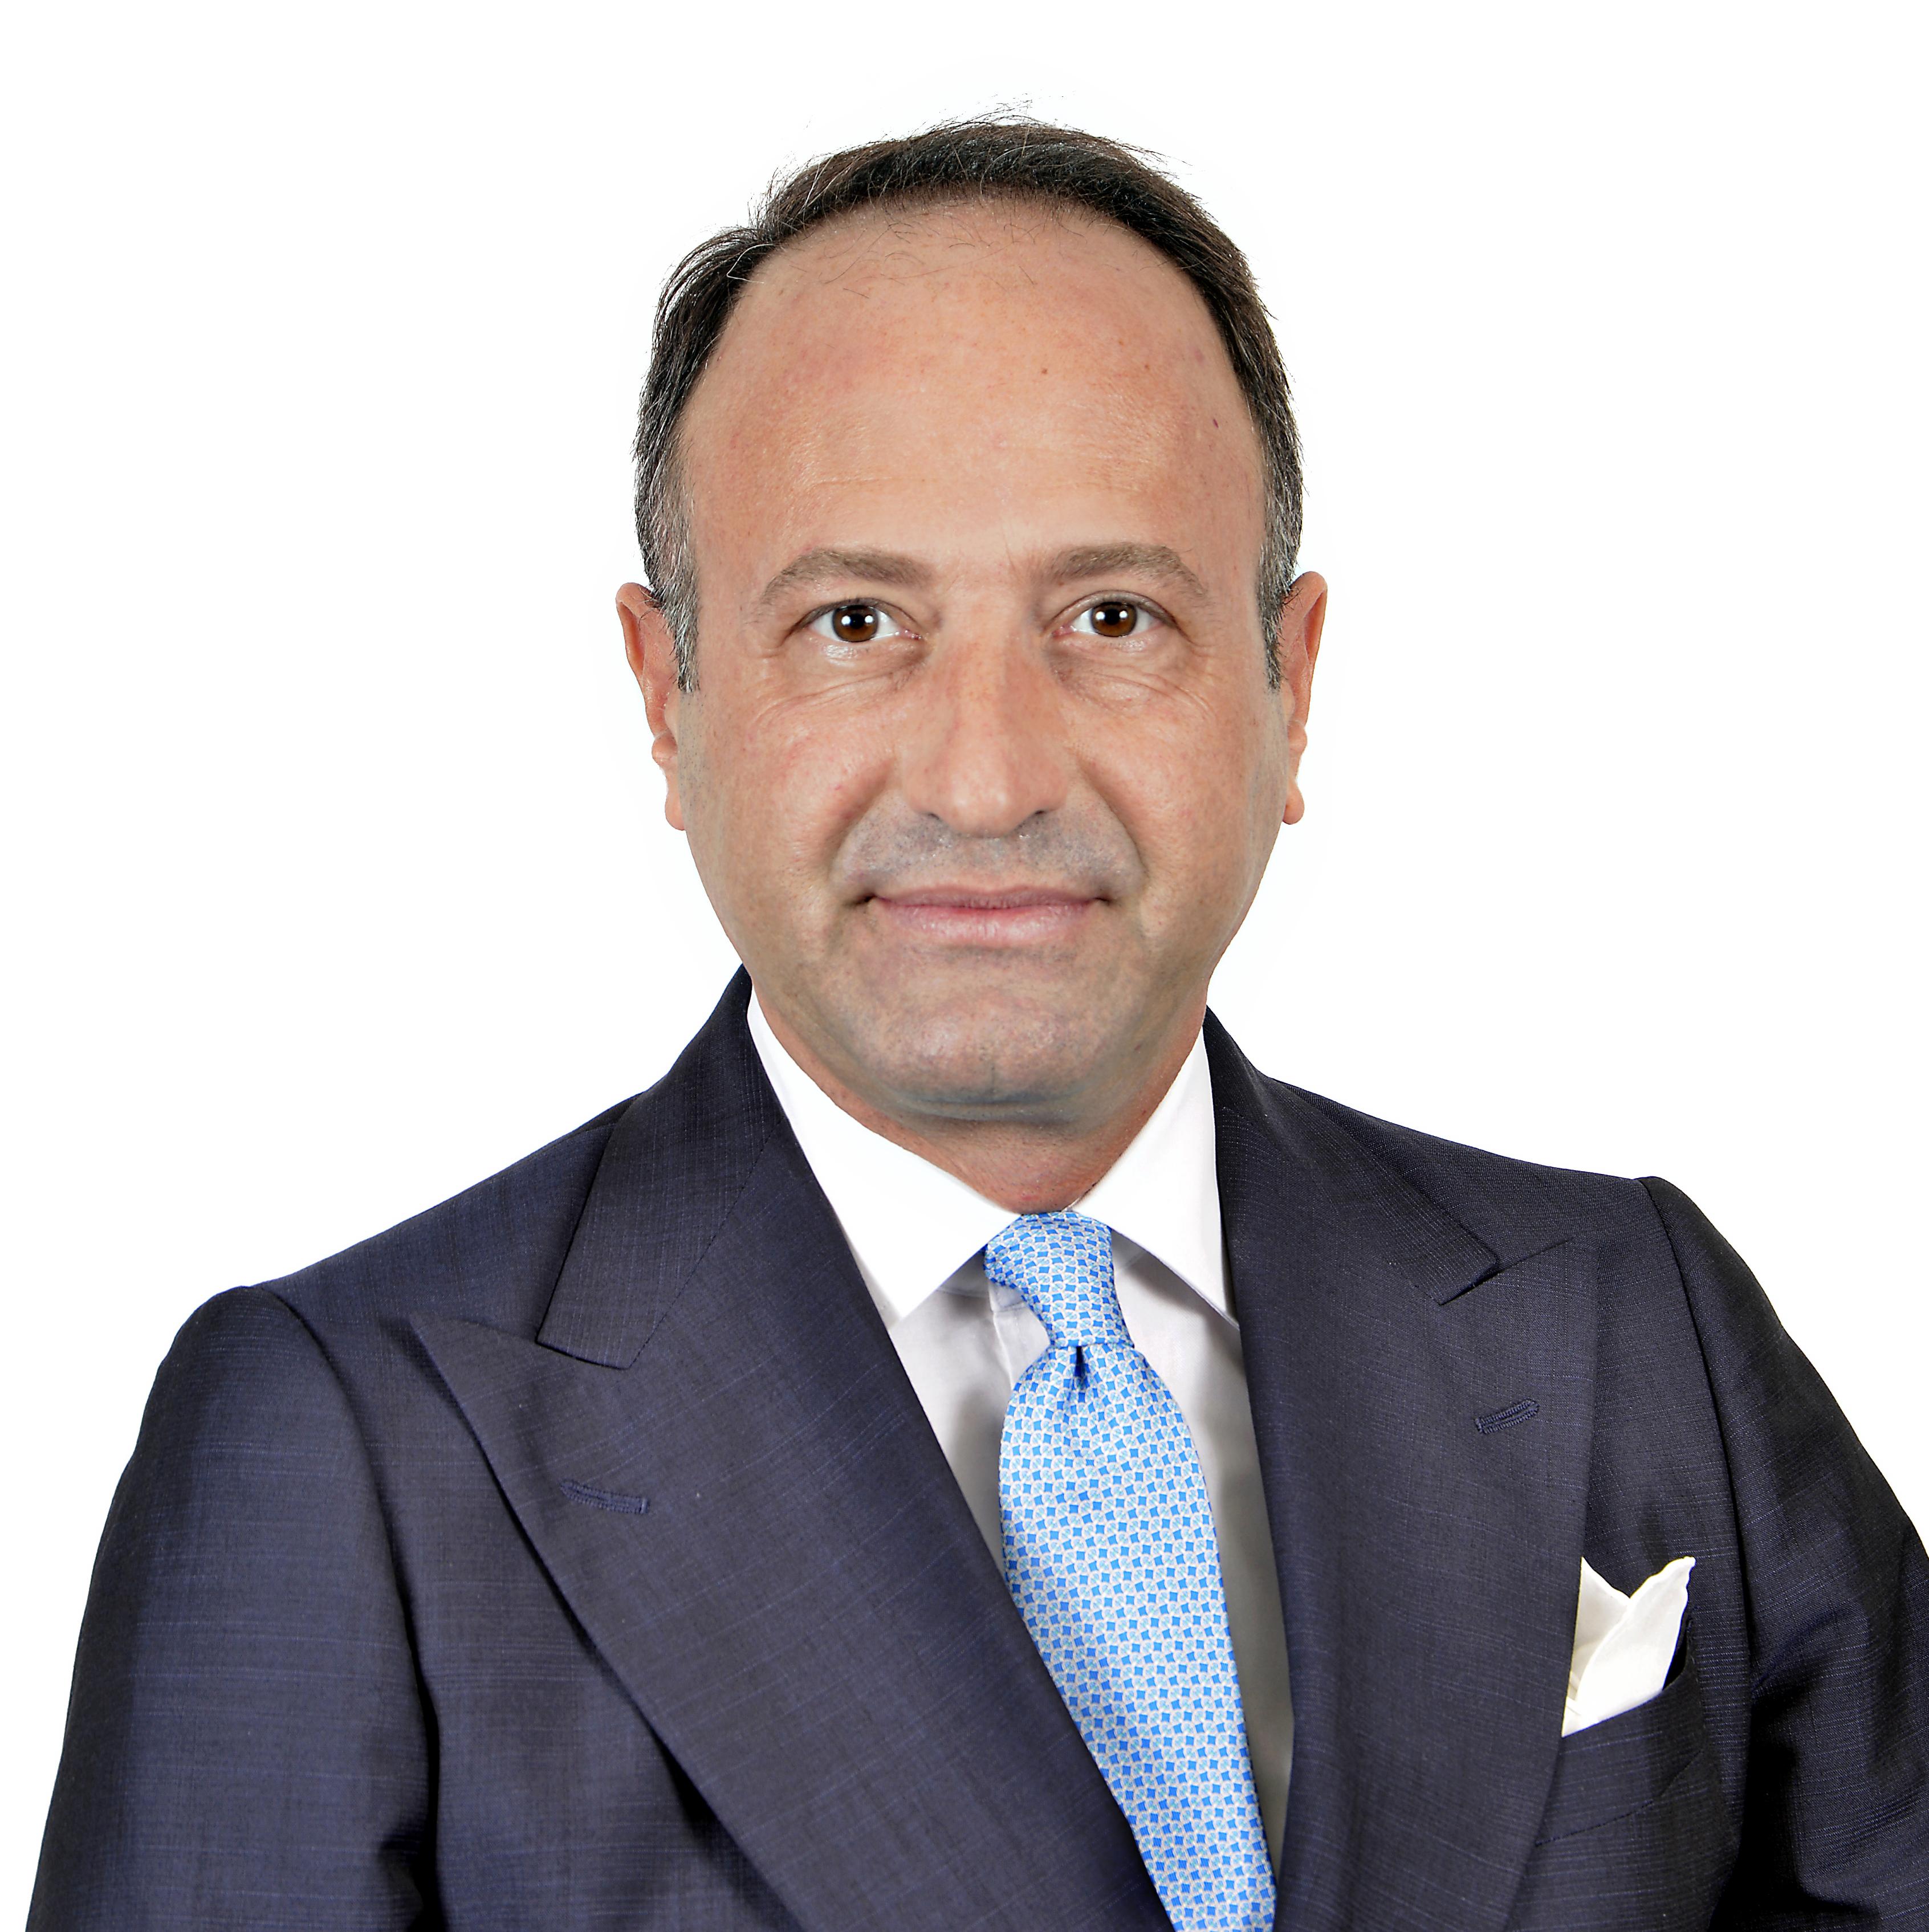 VALENTINO TEOBALDO DAPRILE - Funding & Capital Markets Forum